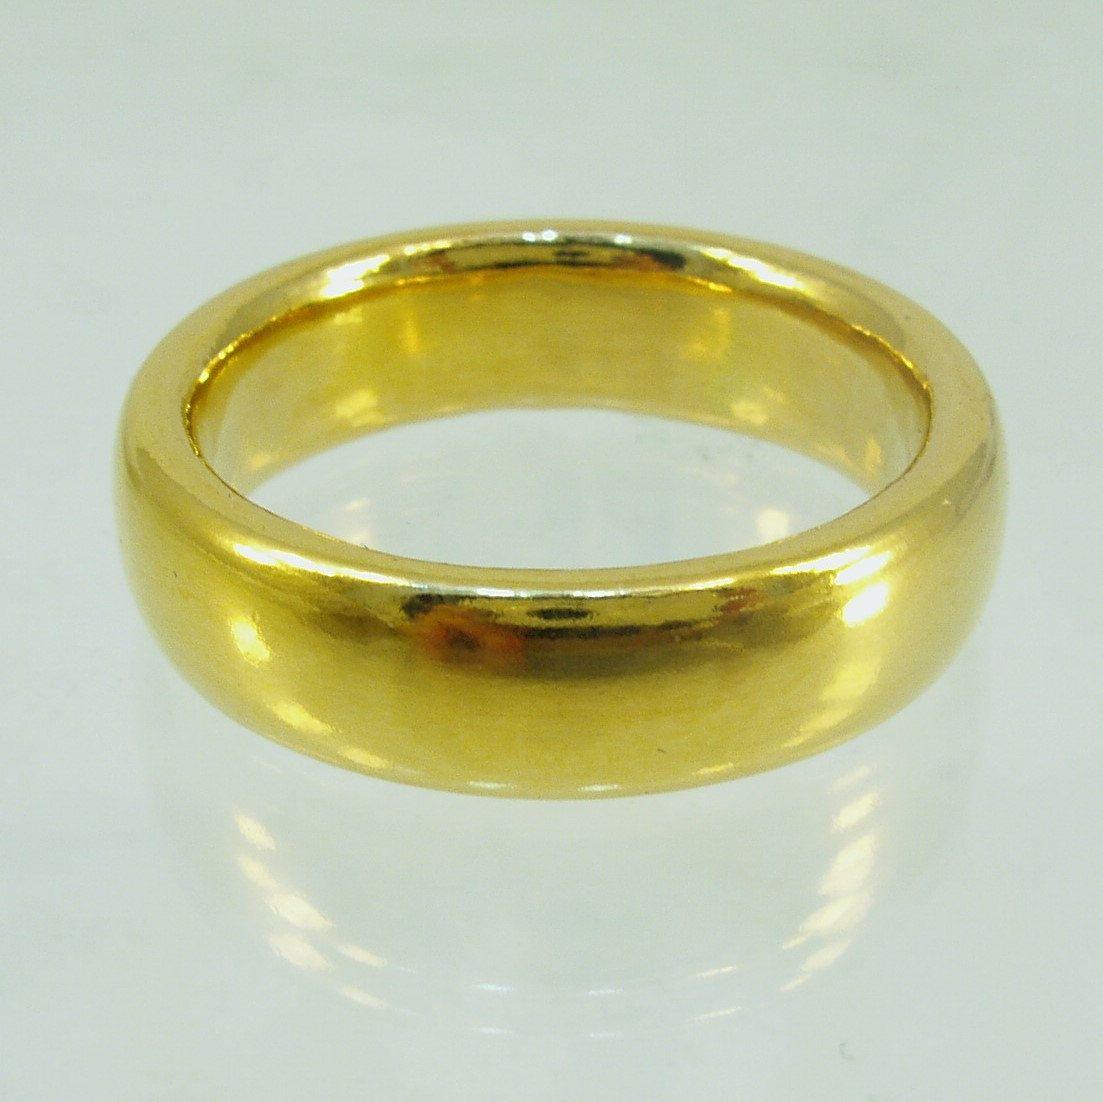 Pure Goldmassive Ringmens Wedding Bandpure Gold24 Karat Etsy Rings Mens Wedding Bands Mens Wedding Bands Mens Gold Wedding Band